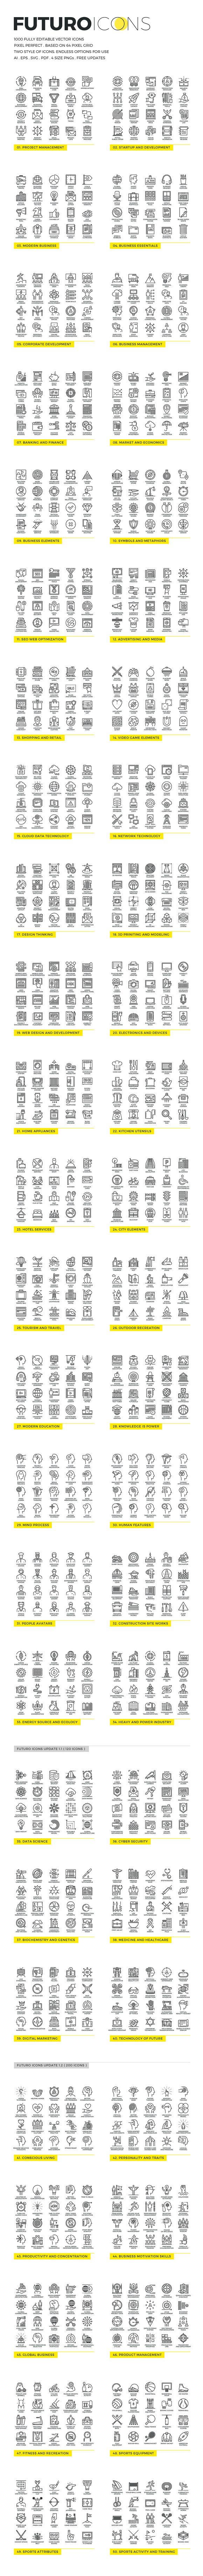 DEOUR - Webdesign Resources & Development - Futuro Line Icons by Bloomua